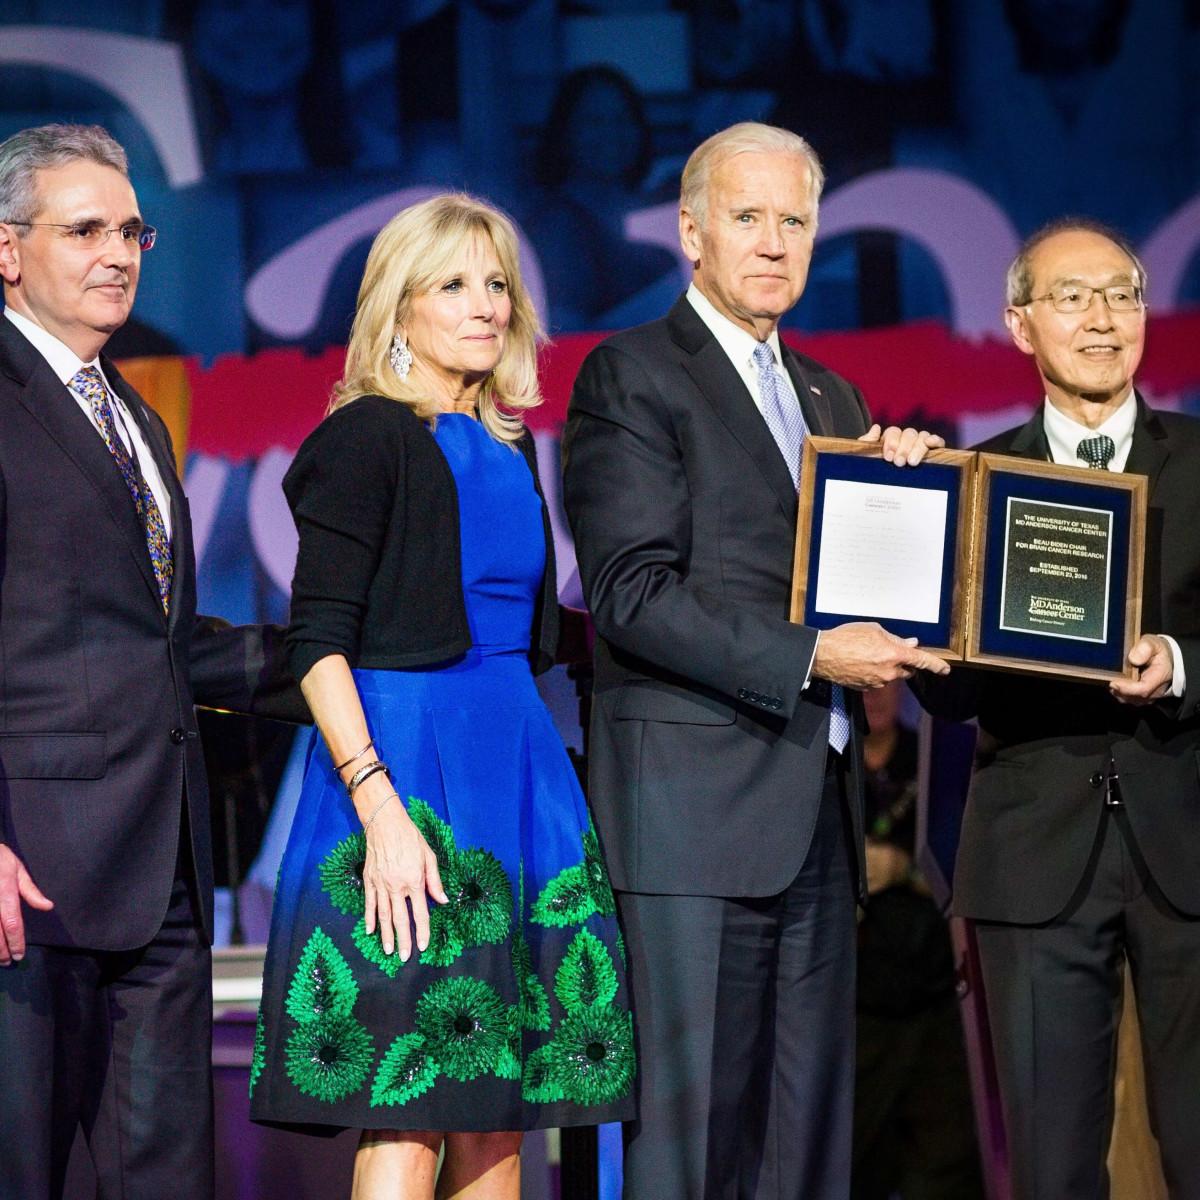 Ronald DePinho, Jill Biden, Joe Biden, Al Yung at MD Anderson gala